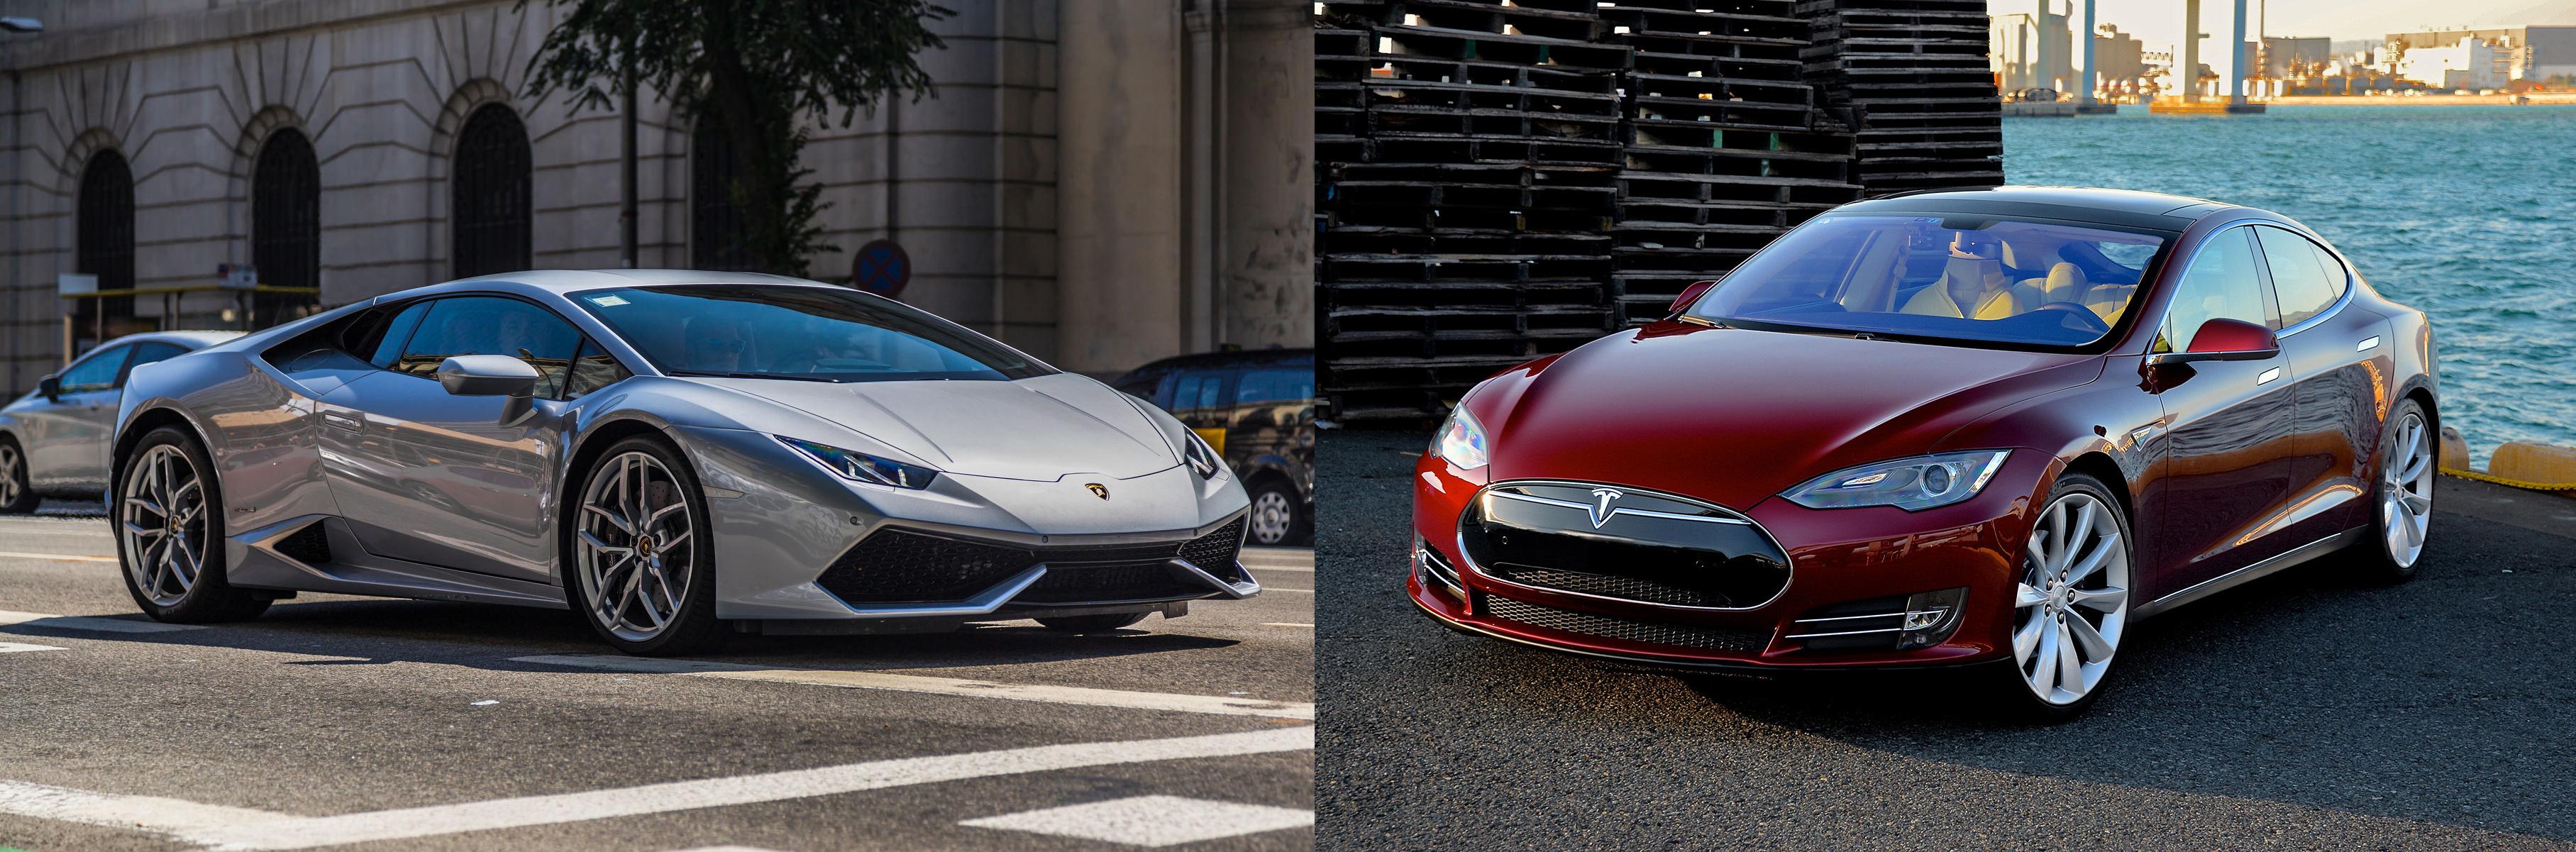 Tesla top speed p100d